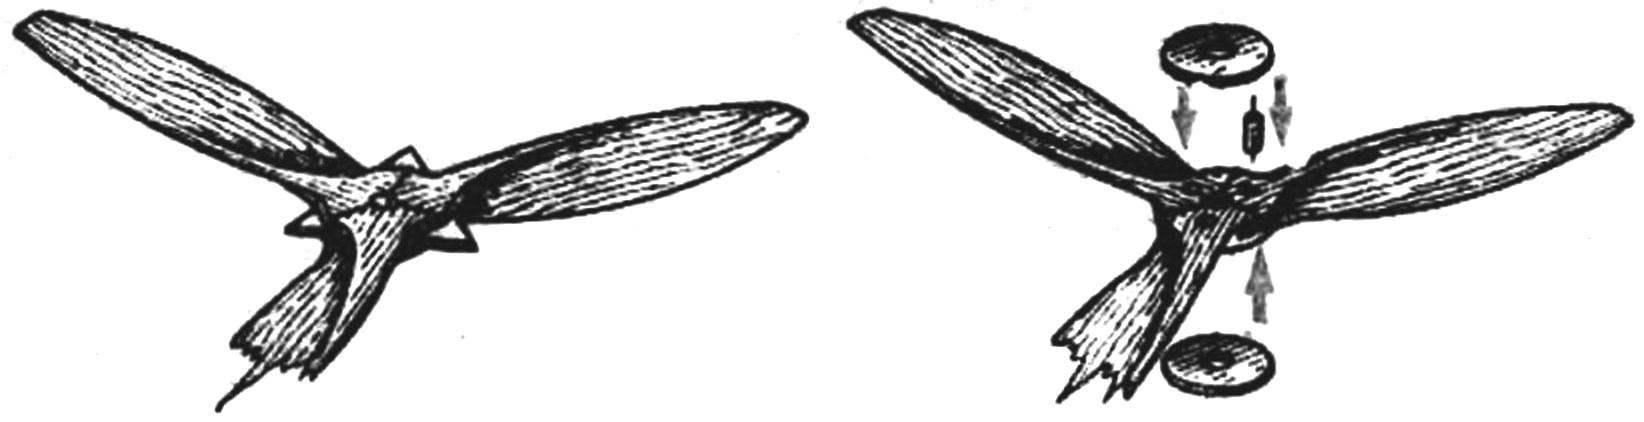 Рис. 3. Сборка пропеллера.